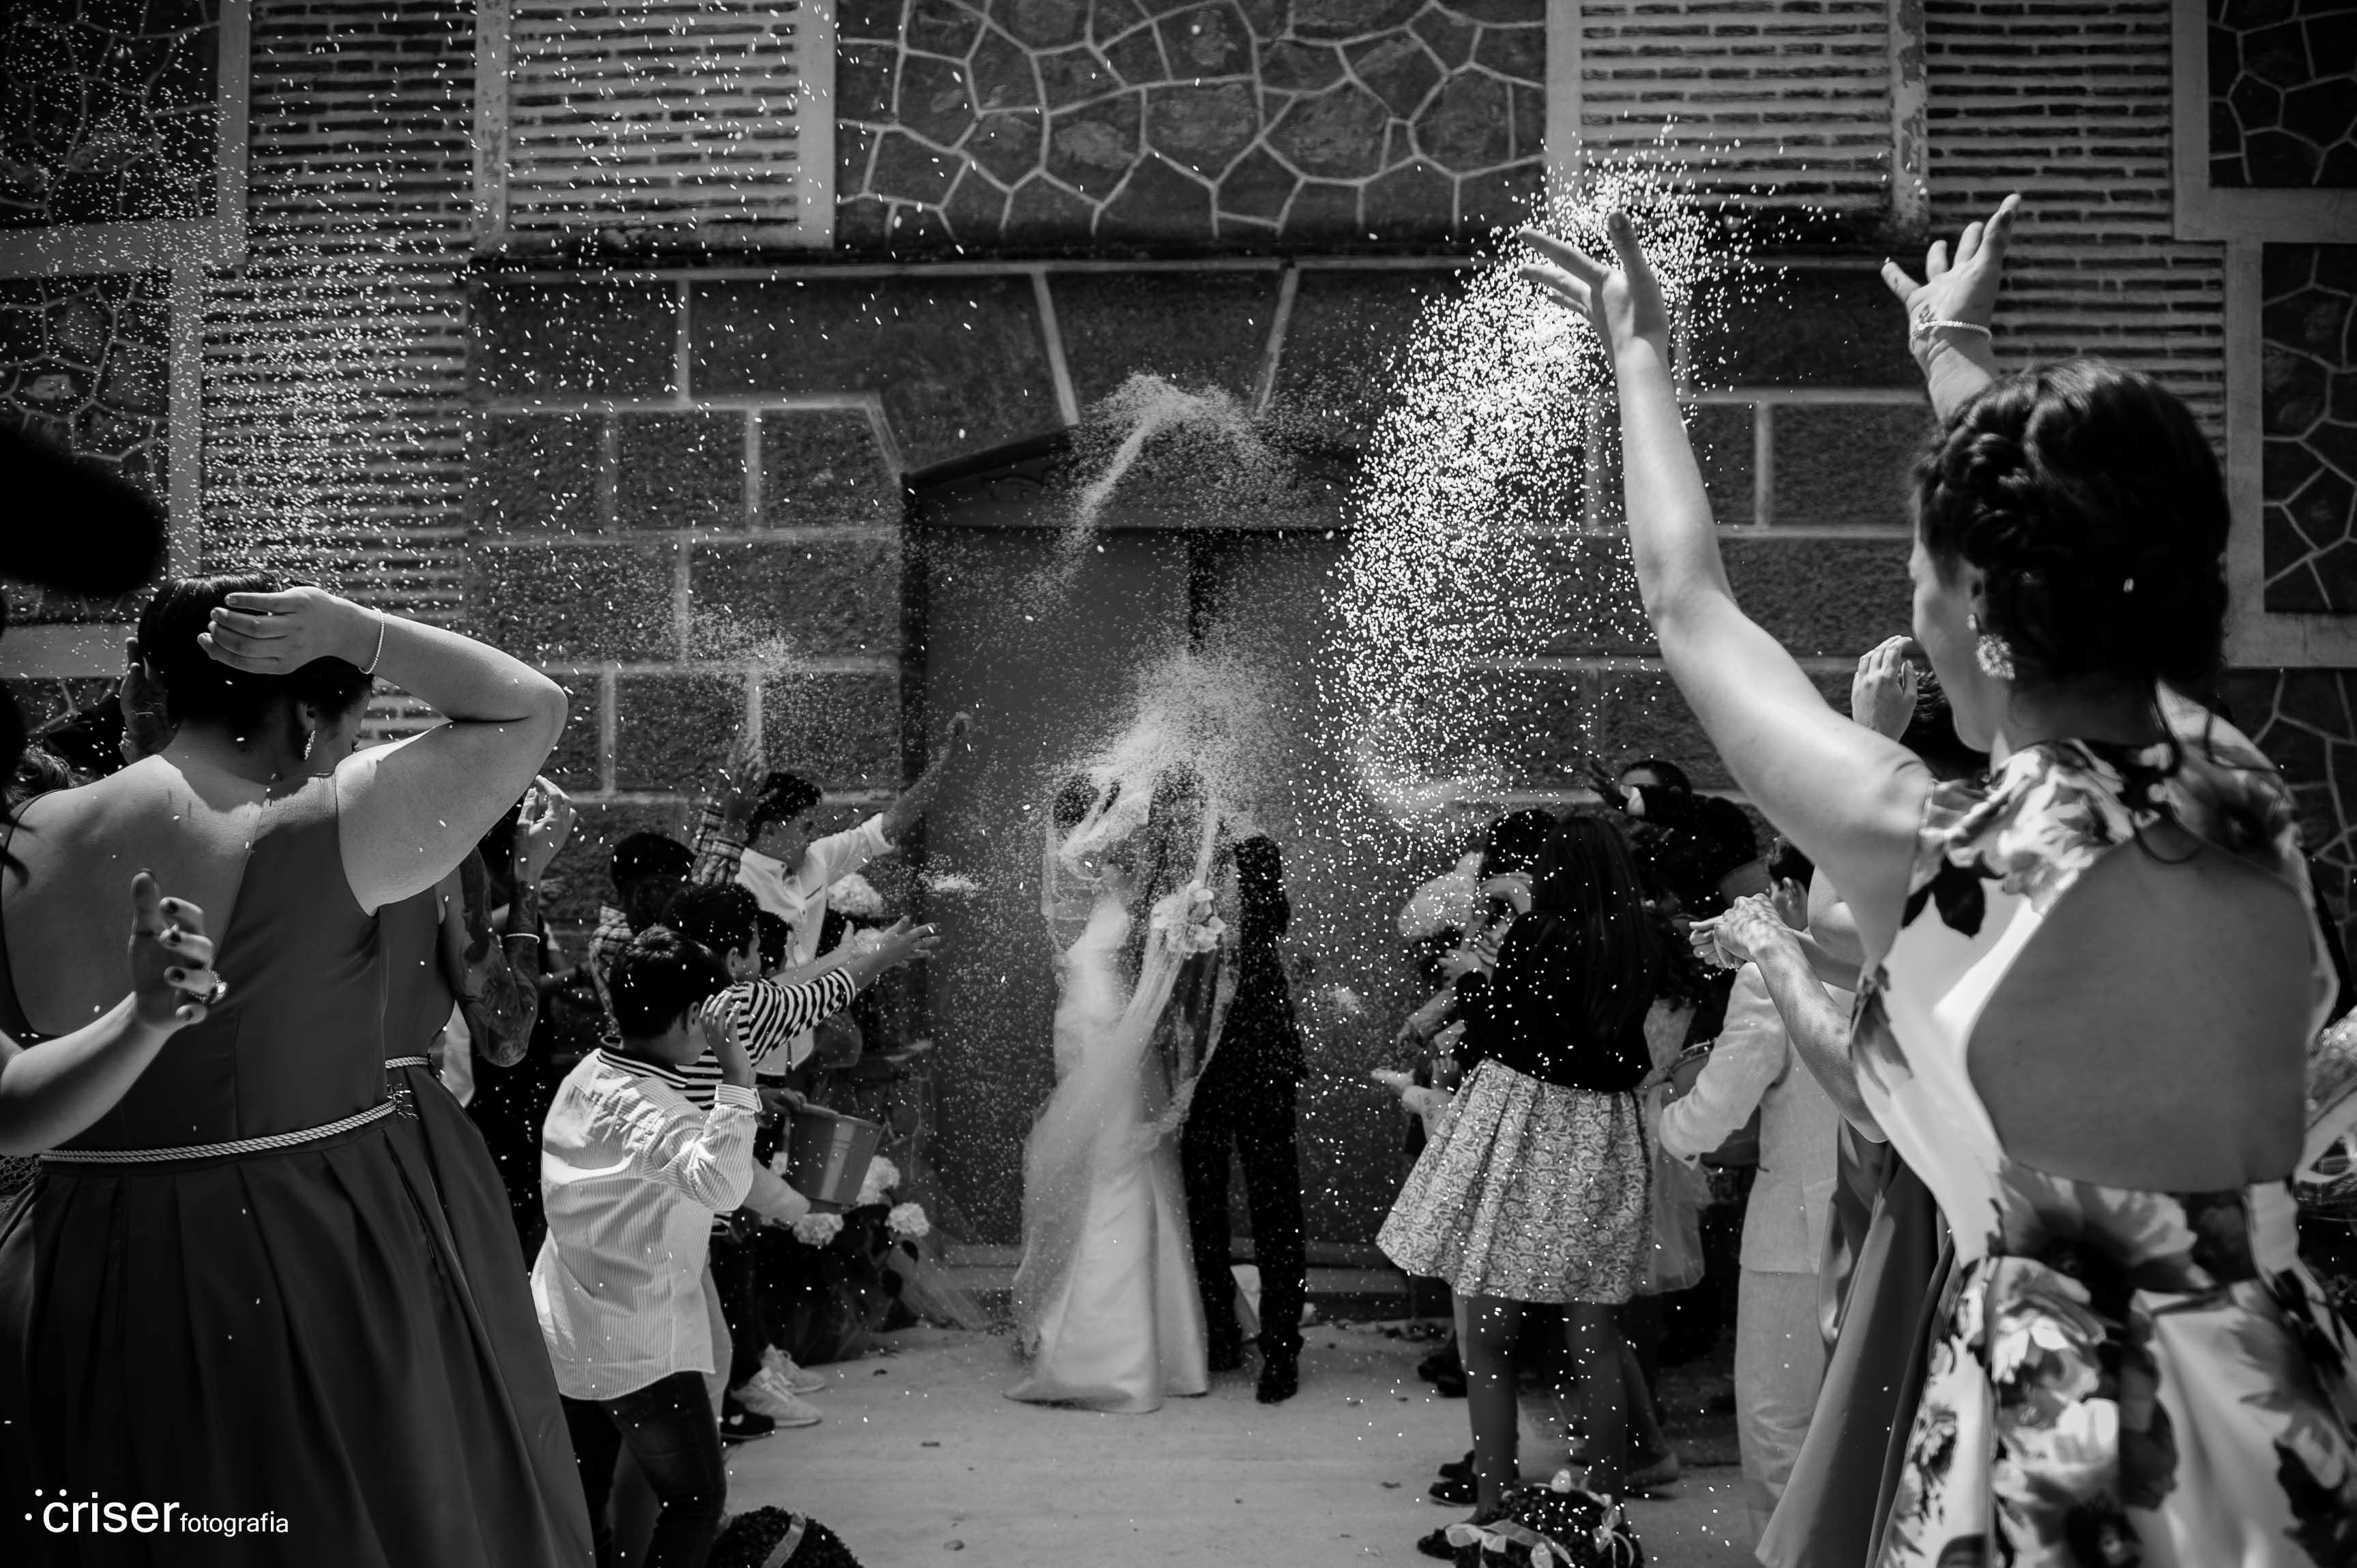 bodas Murcia-Mula-Criserfotografia